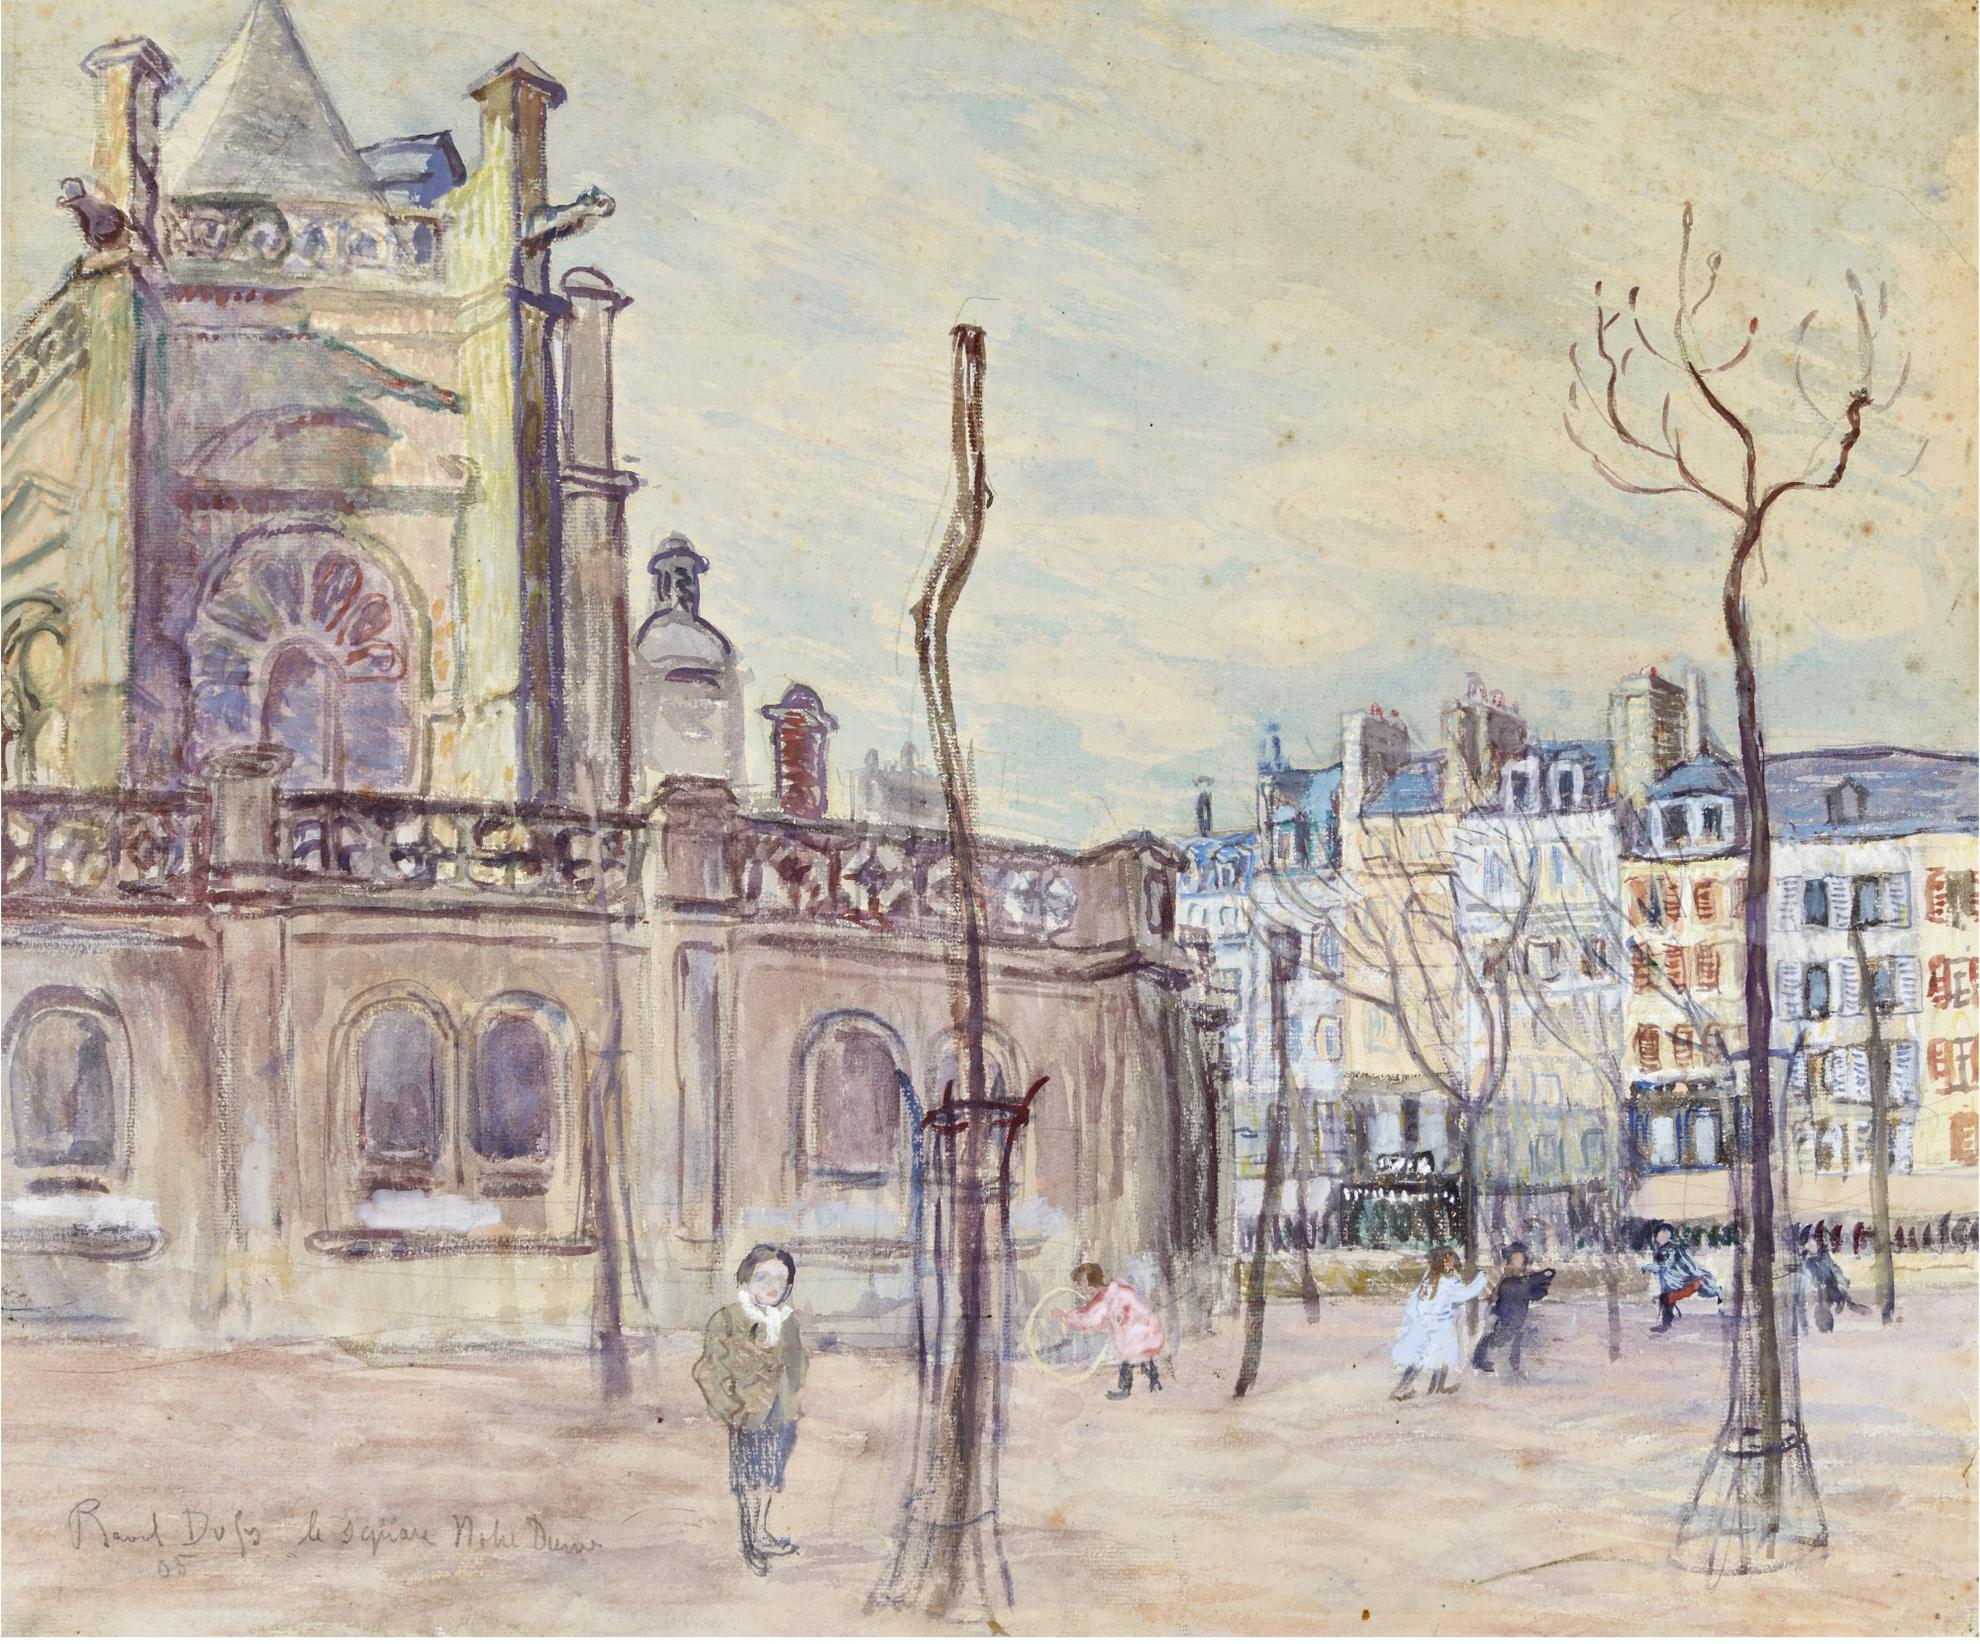 Raoul Dufy-Le Square Notre-Dame-1905